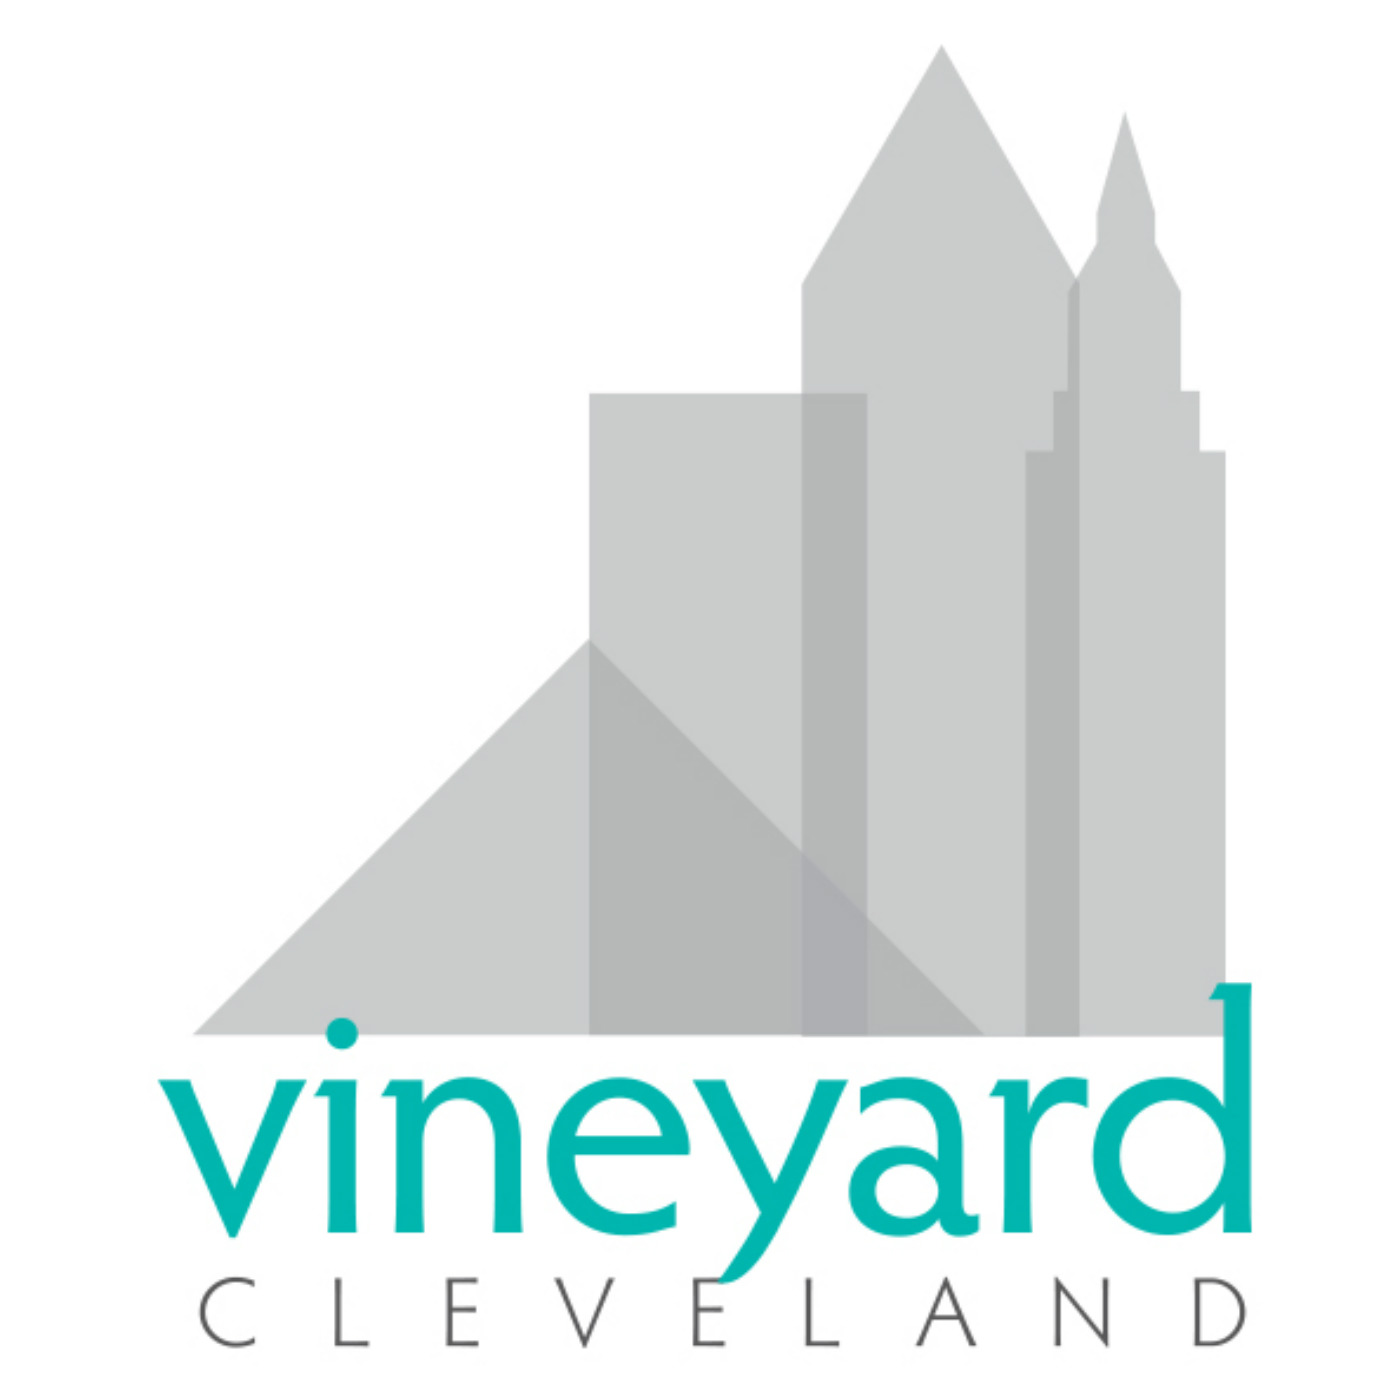 Vineyard Cleveland Sermons